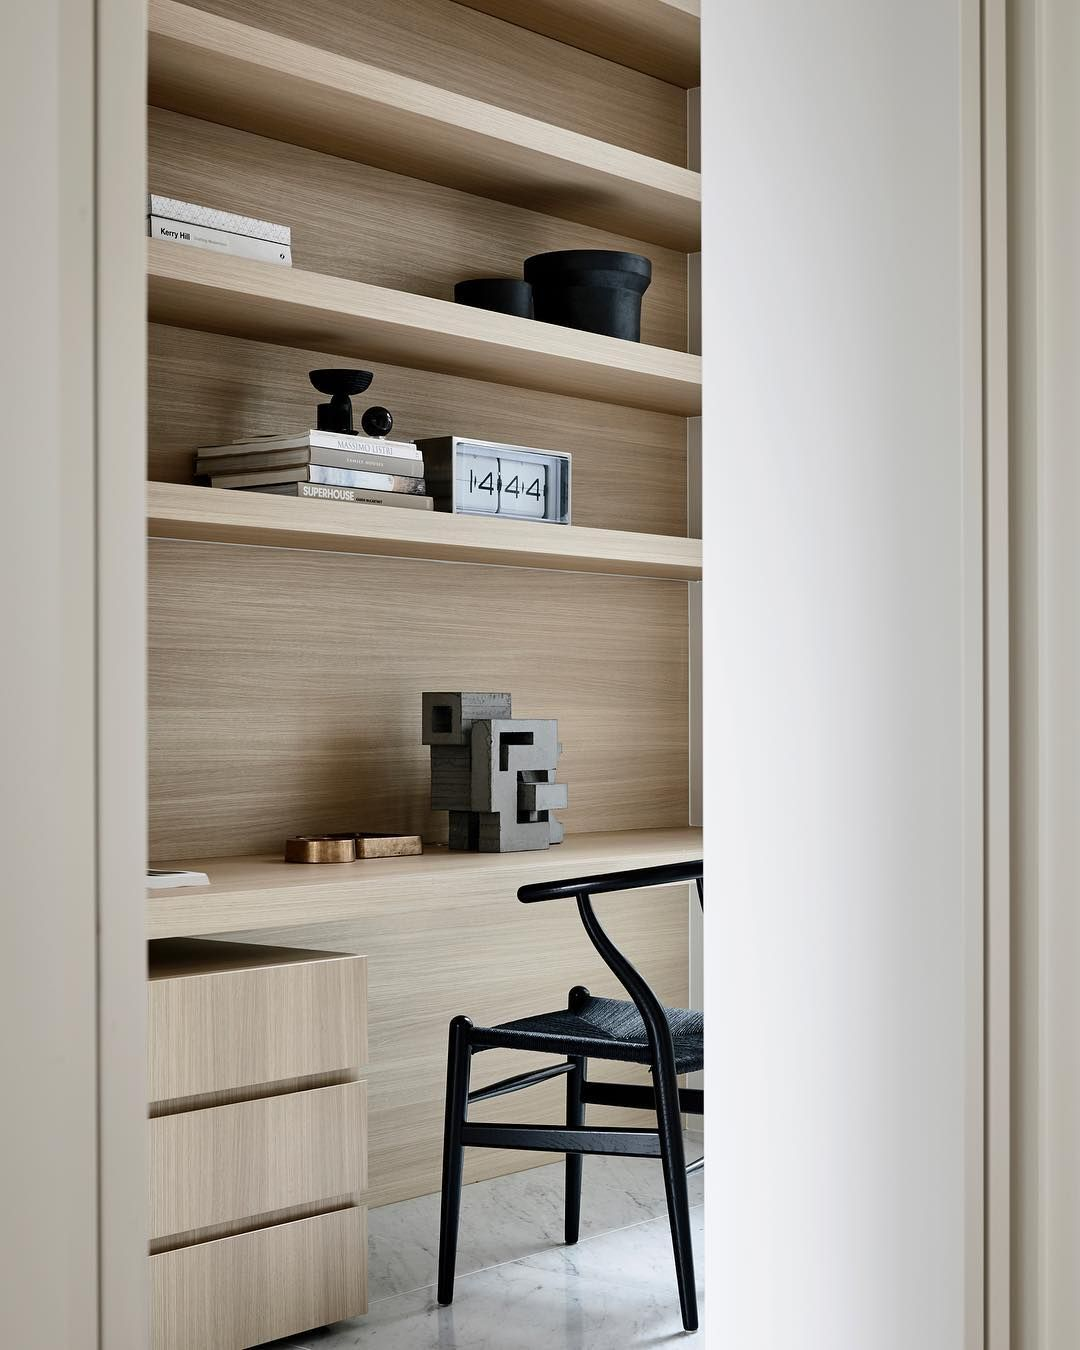 Minimalist Office + Bookshelf Styling Inspiration